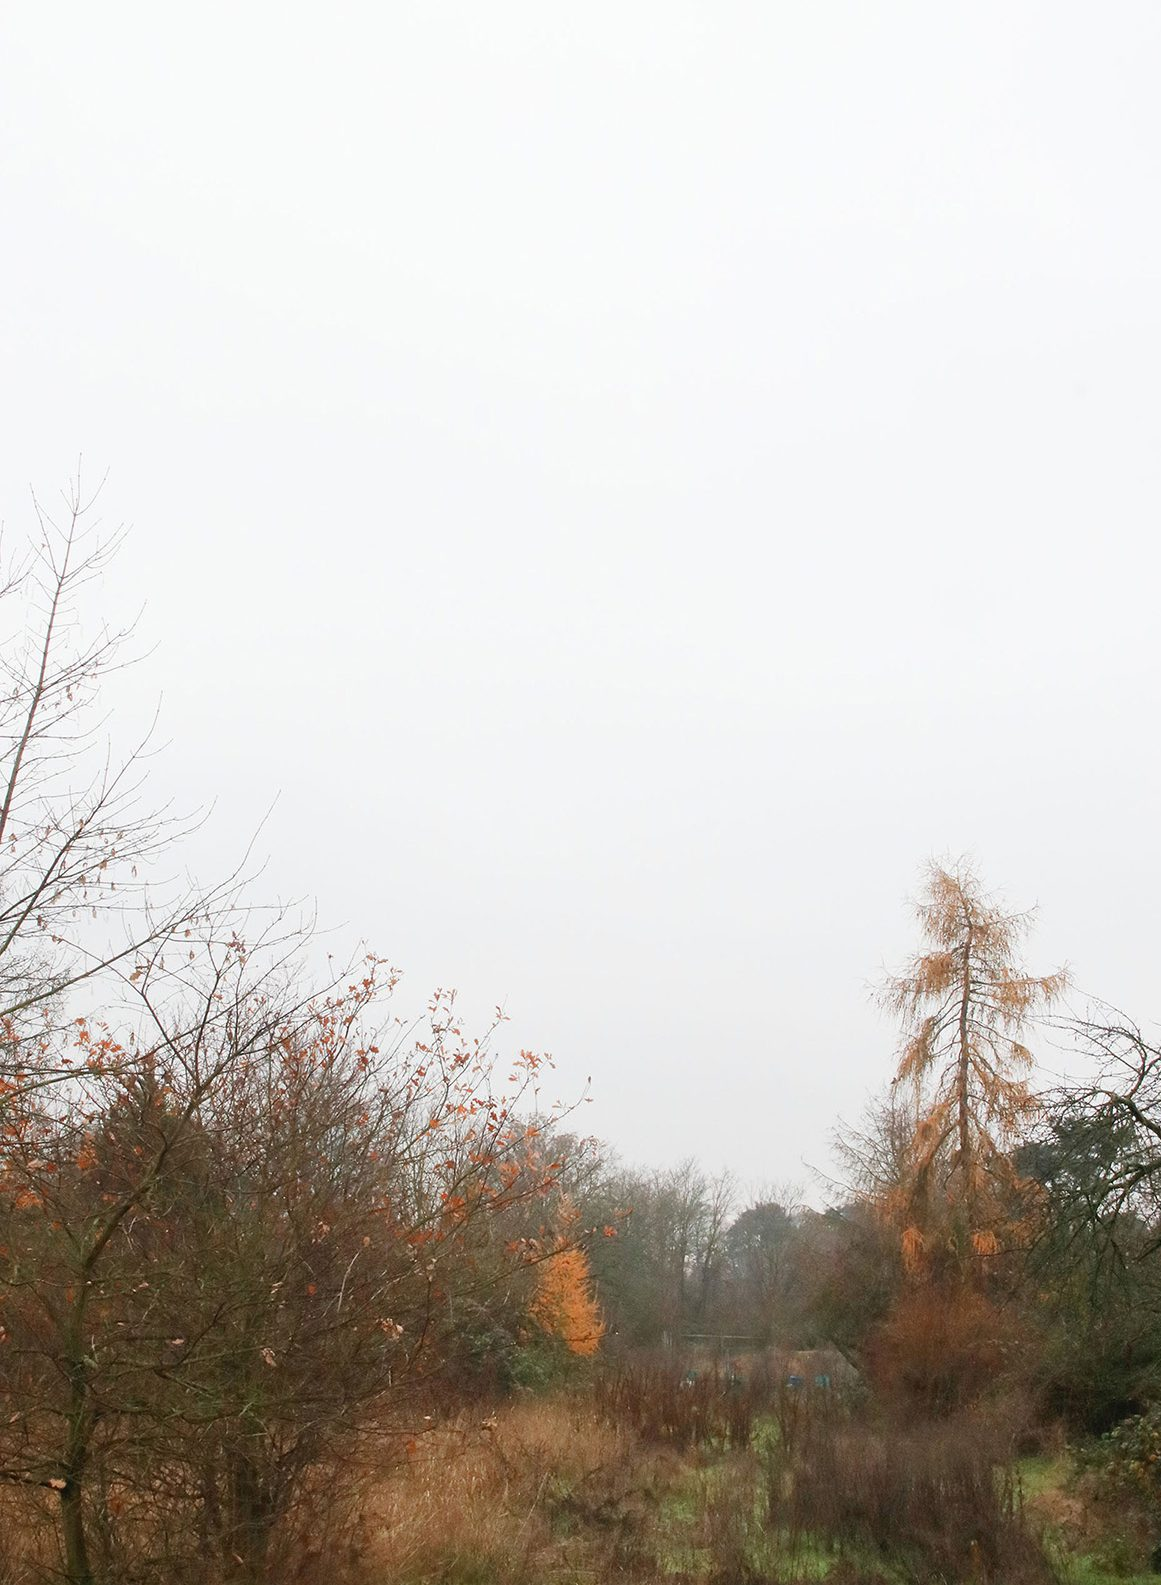 roter Baum, Nathalie Heinke